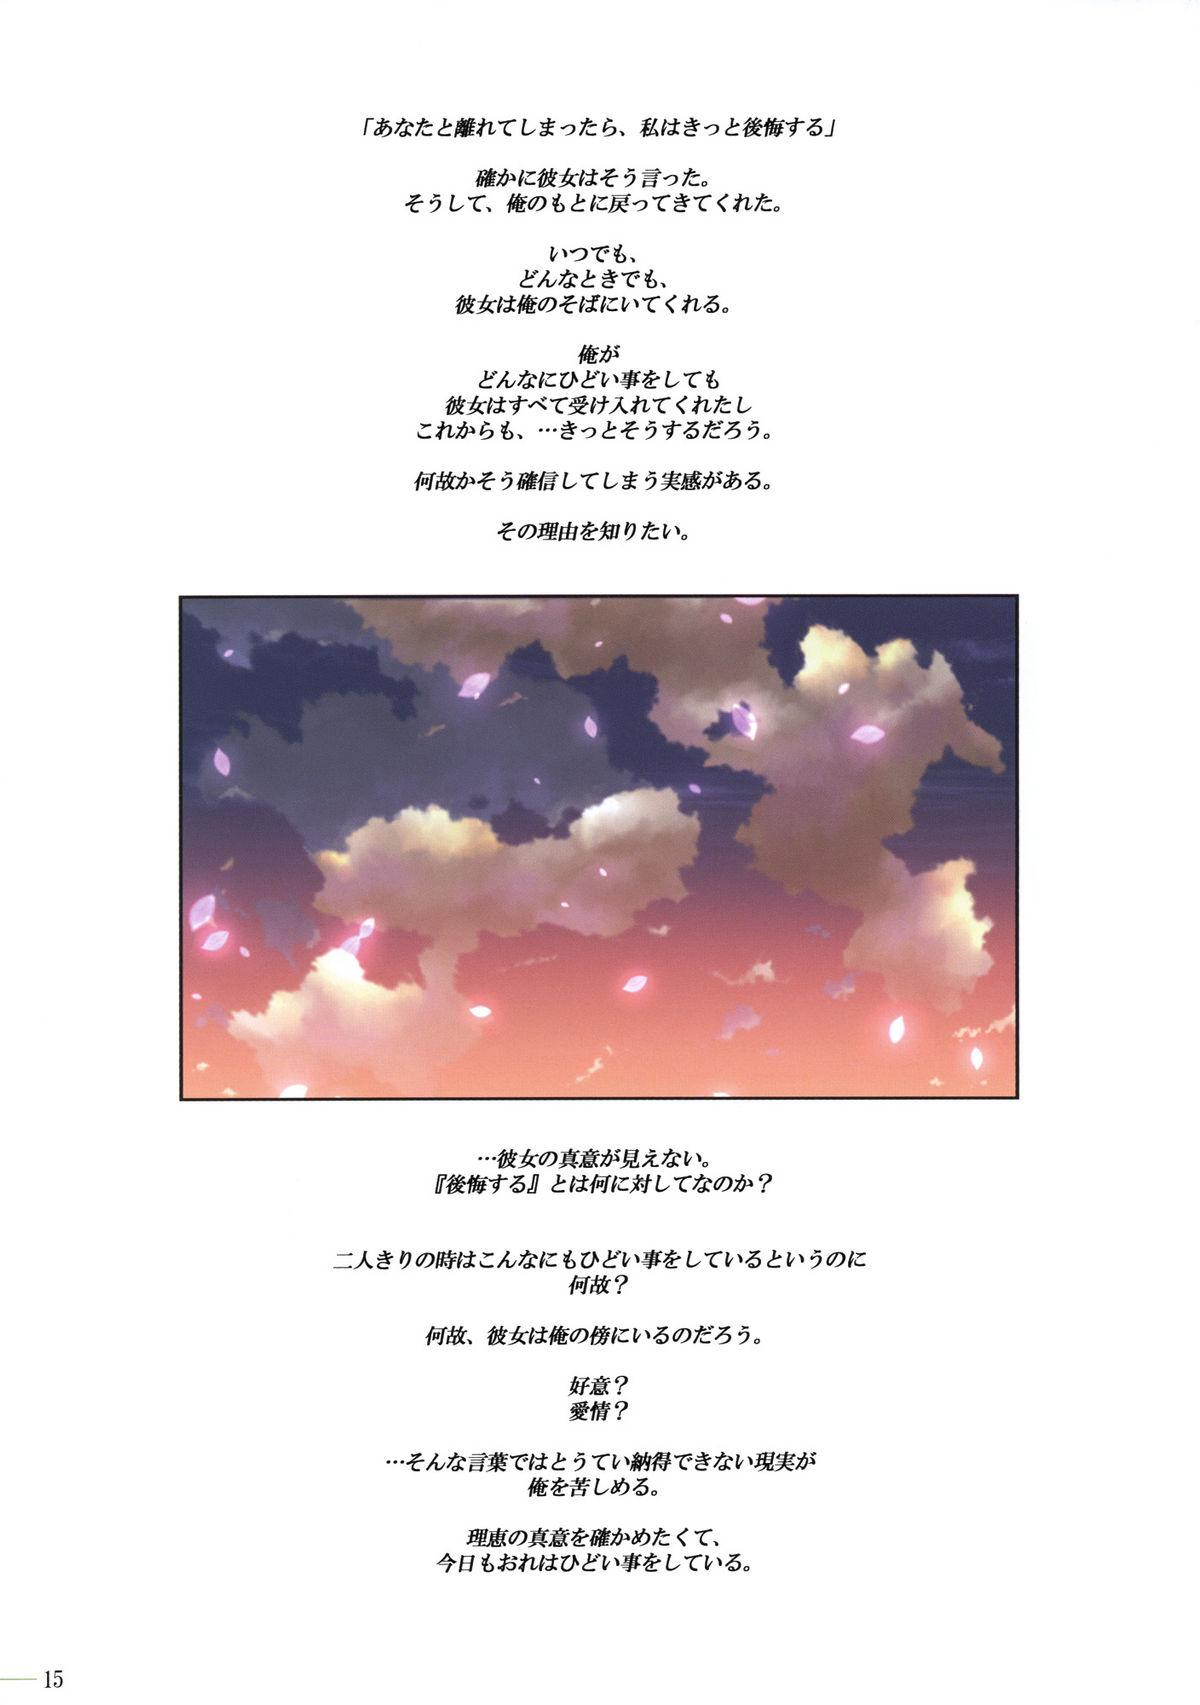 (C77) [Makino Jimusho (Taki Minashika)] LOVERS ~Koi ni Ochitara... ~Blindo LOVERS ~she is everything I need she is everything I'm not~ SIDE:A 13